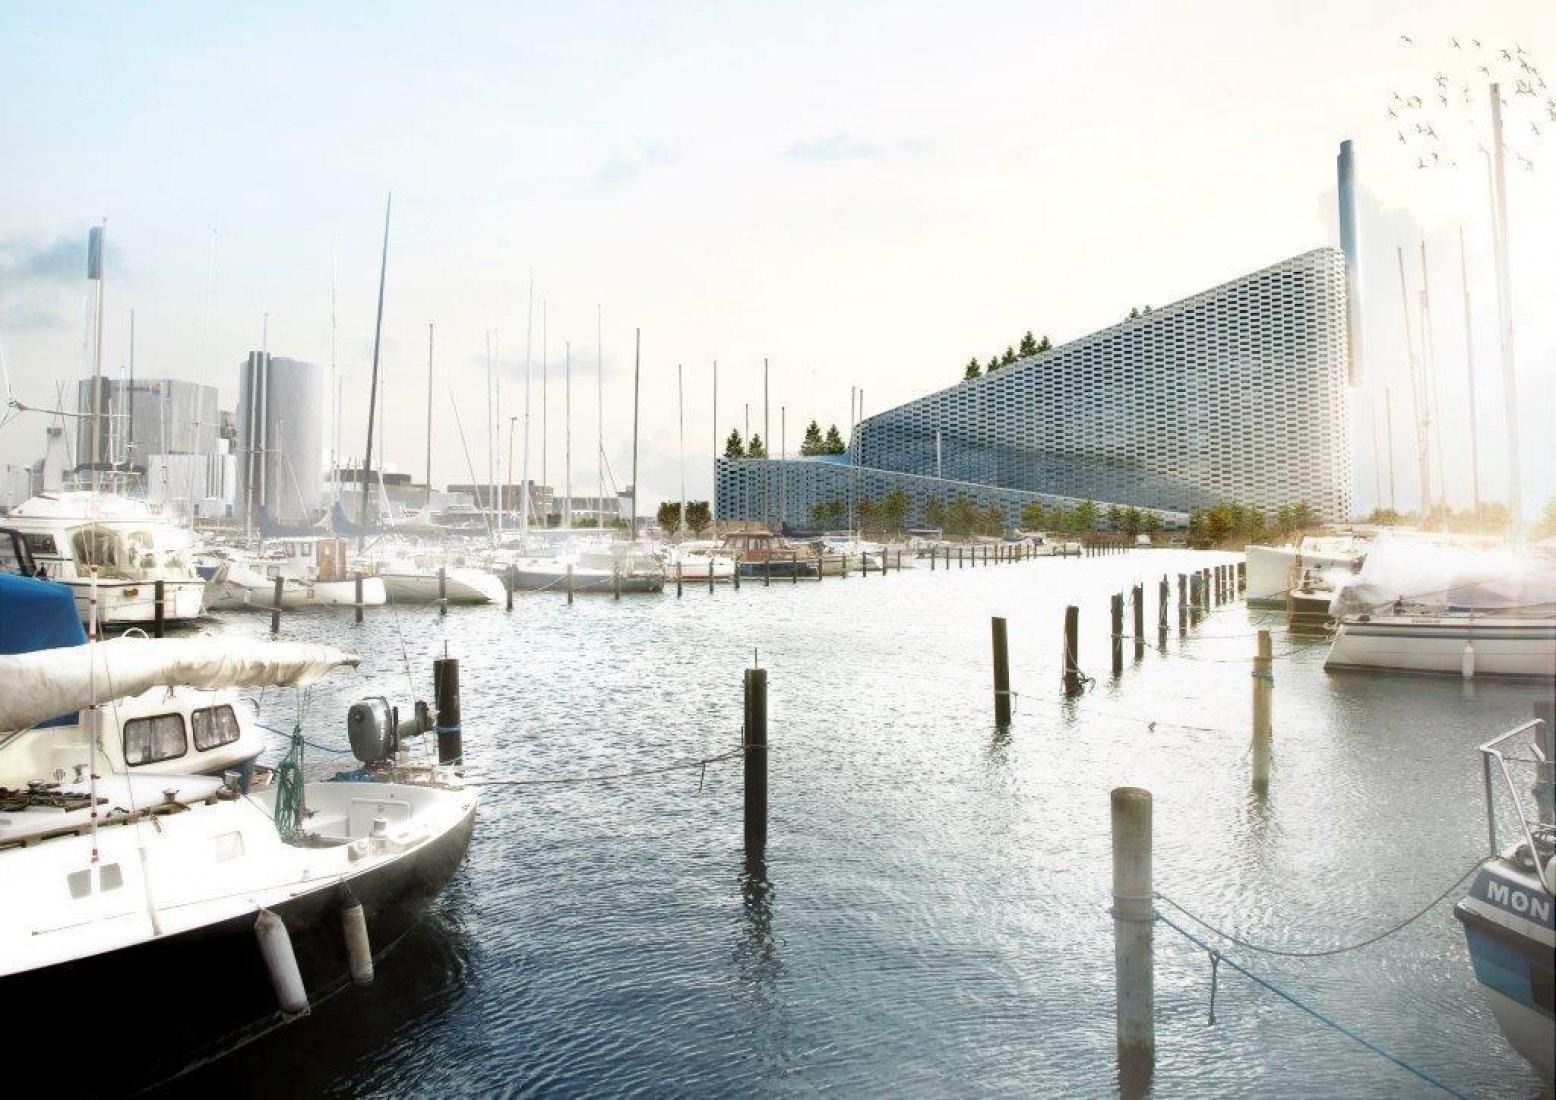 Rendering exterior from harbor. Amager Bakke Waste-to-Energy Plant by BIG-Bjarke Ingels Group.